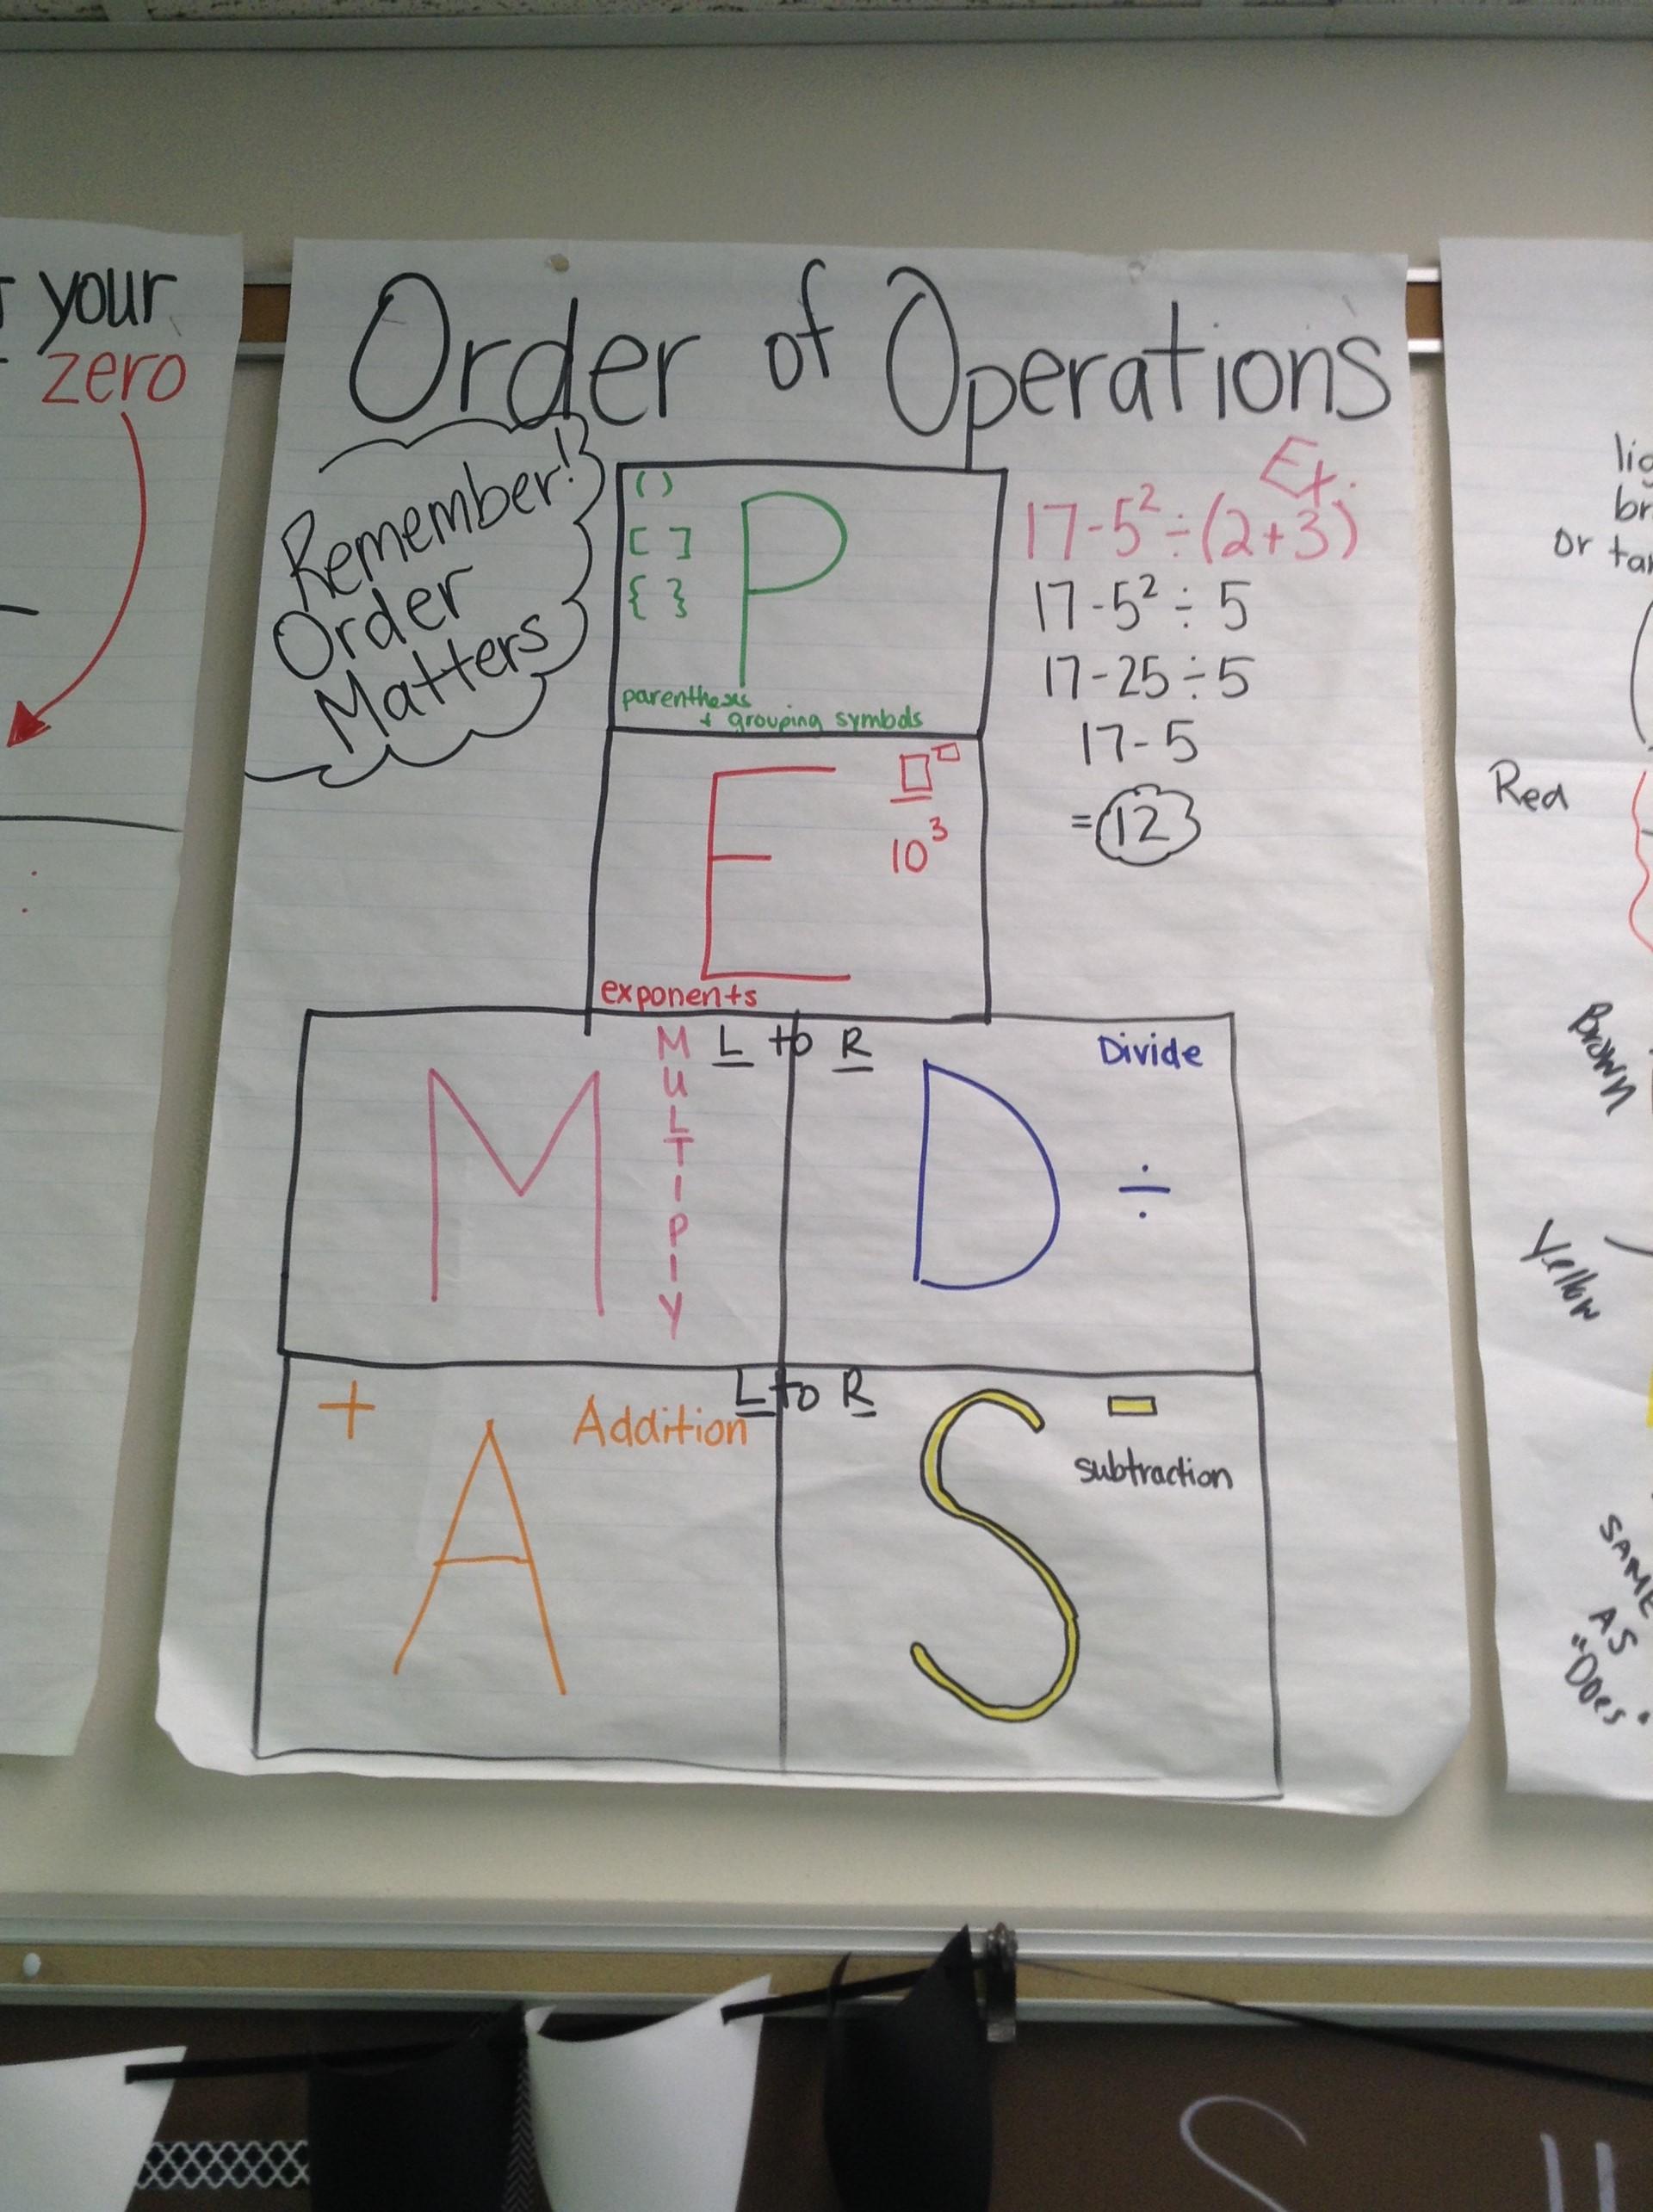 Order of Operations-PEMDAS